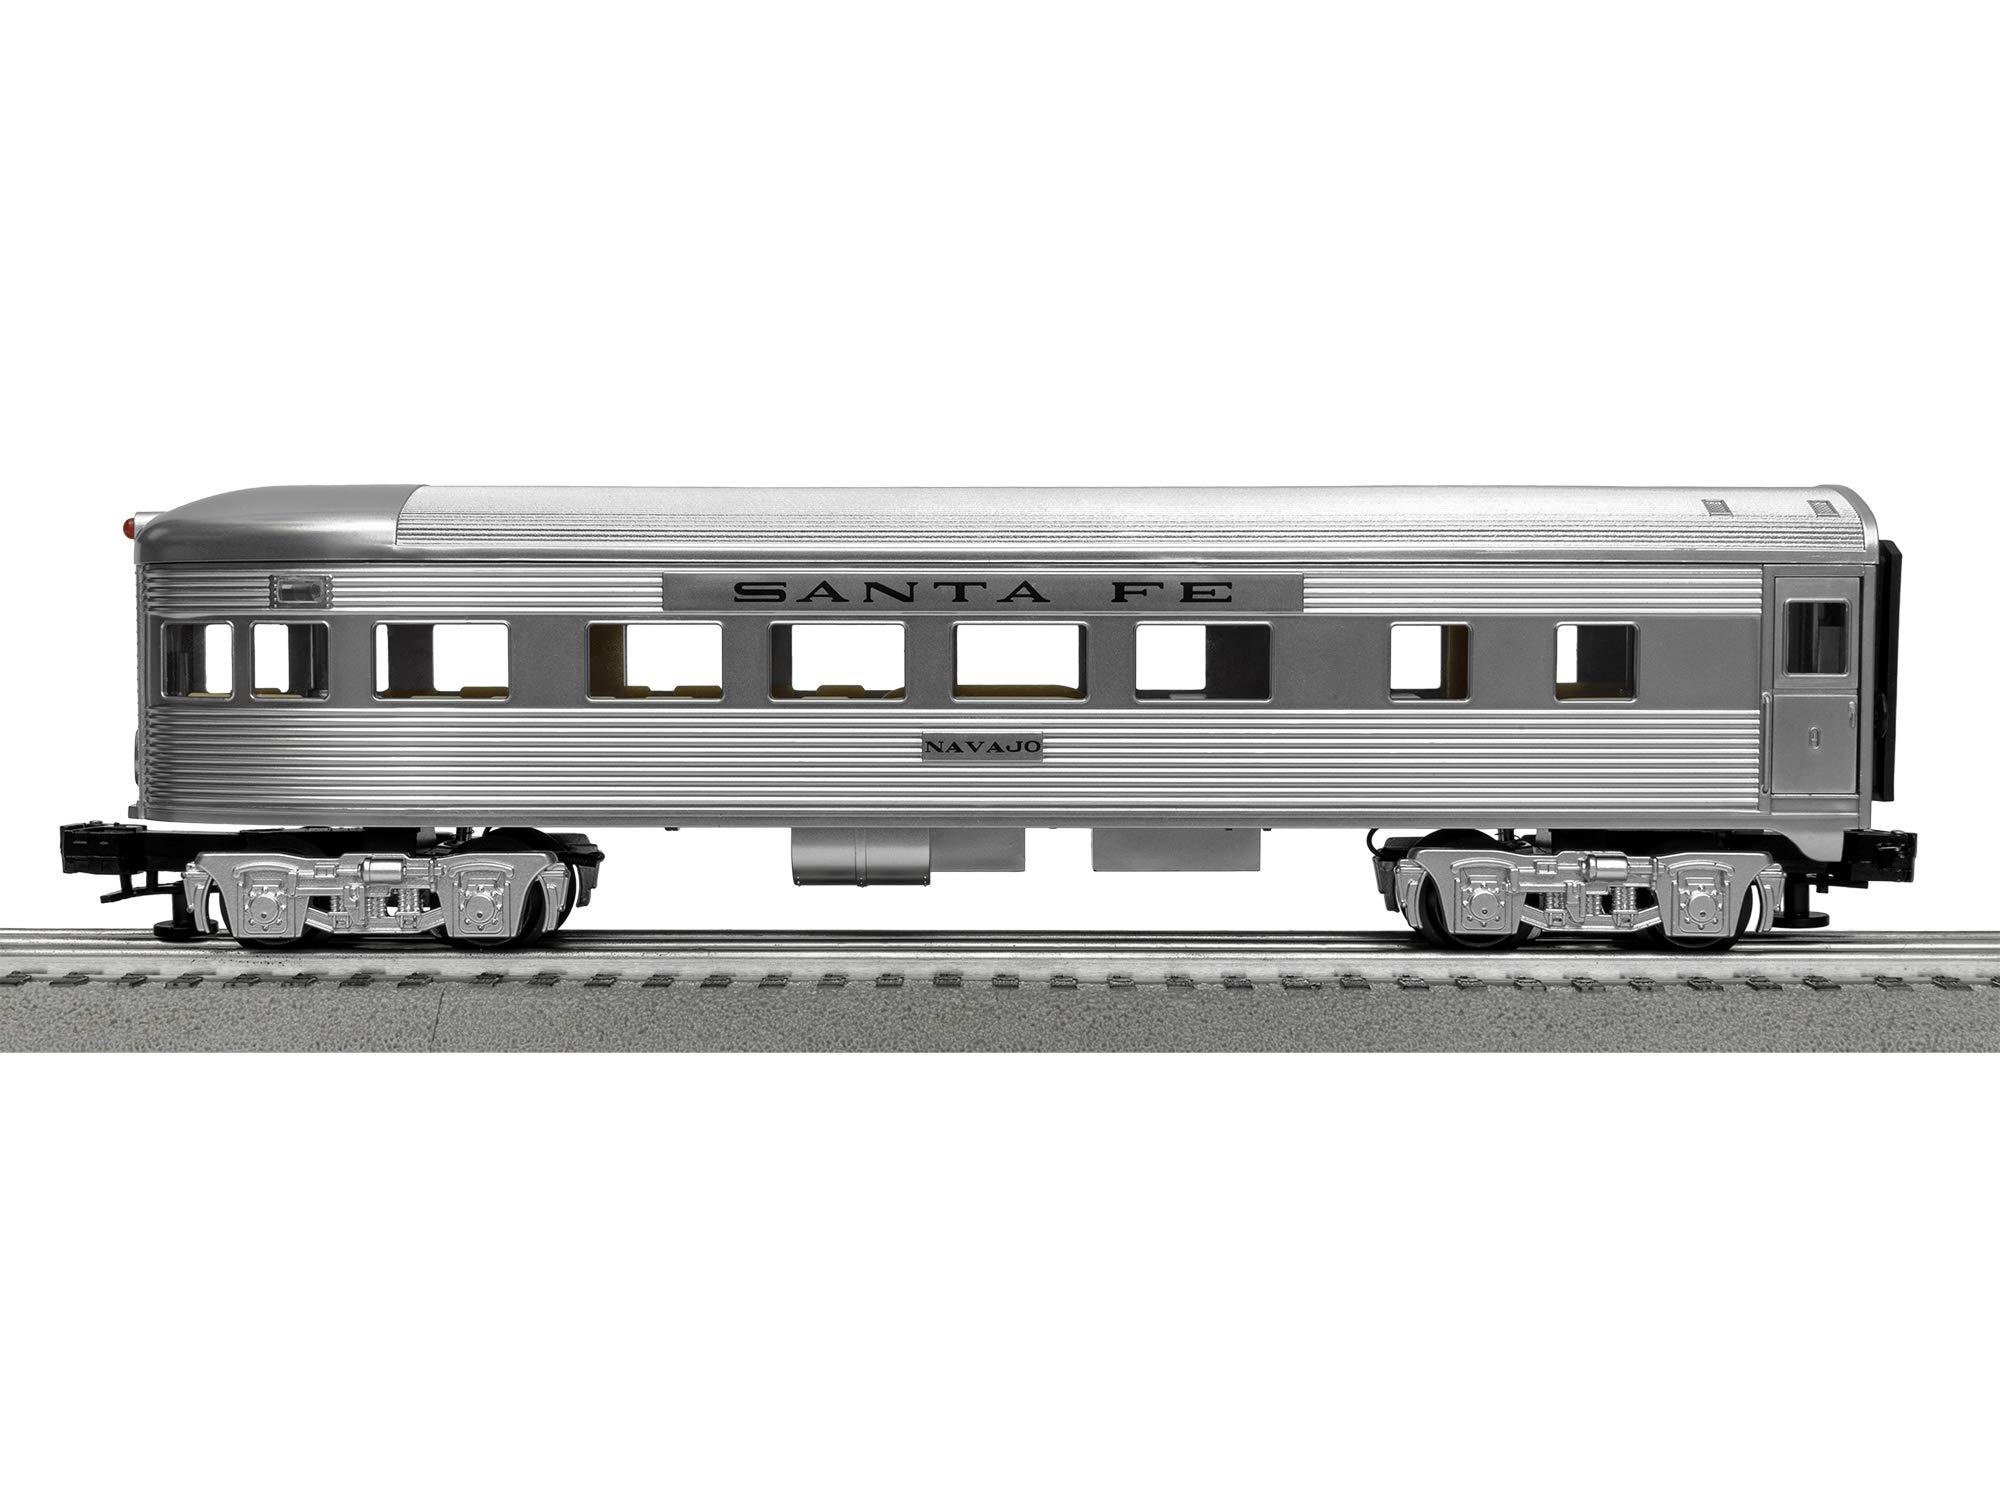 Lionel Santa Fe Super Chief Electric O Gauge Model Train Set w/ Remote and Bluetooth Capability by Lionel (Image #7)